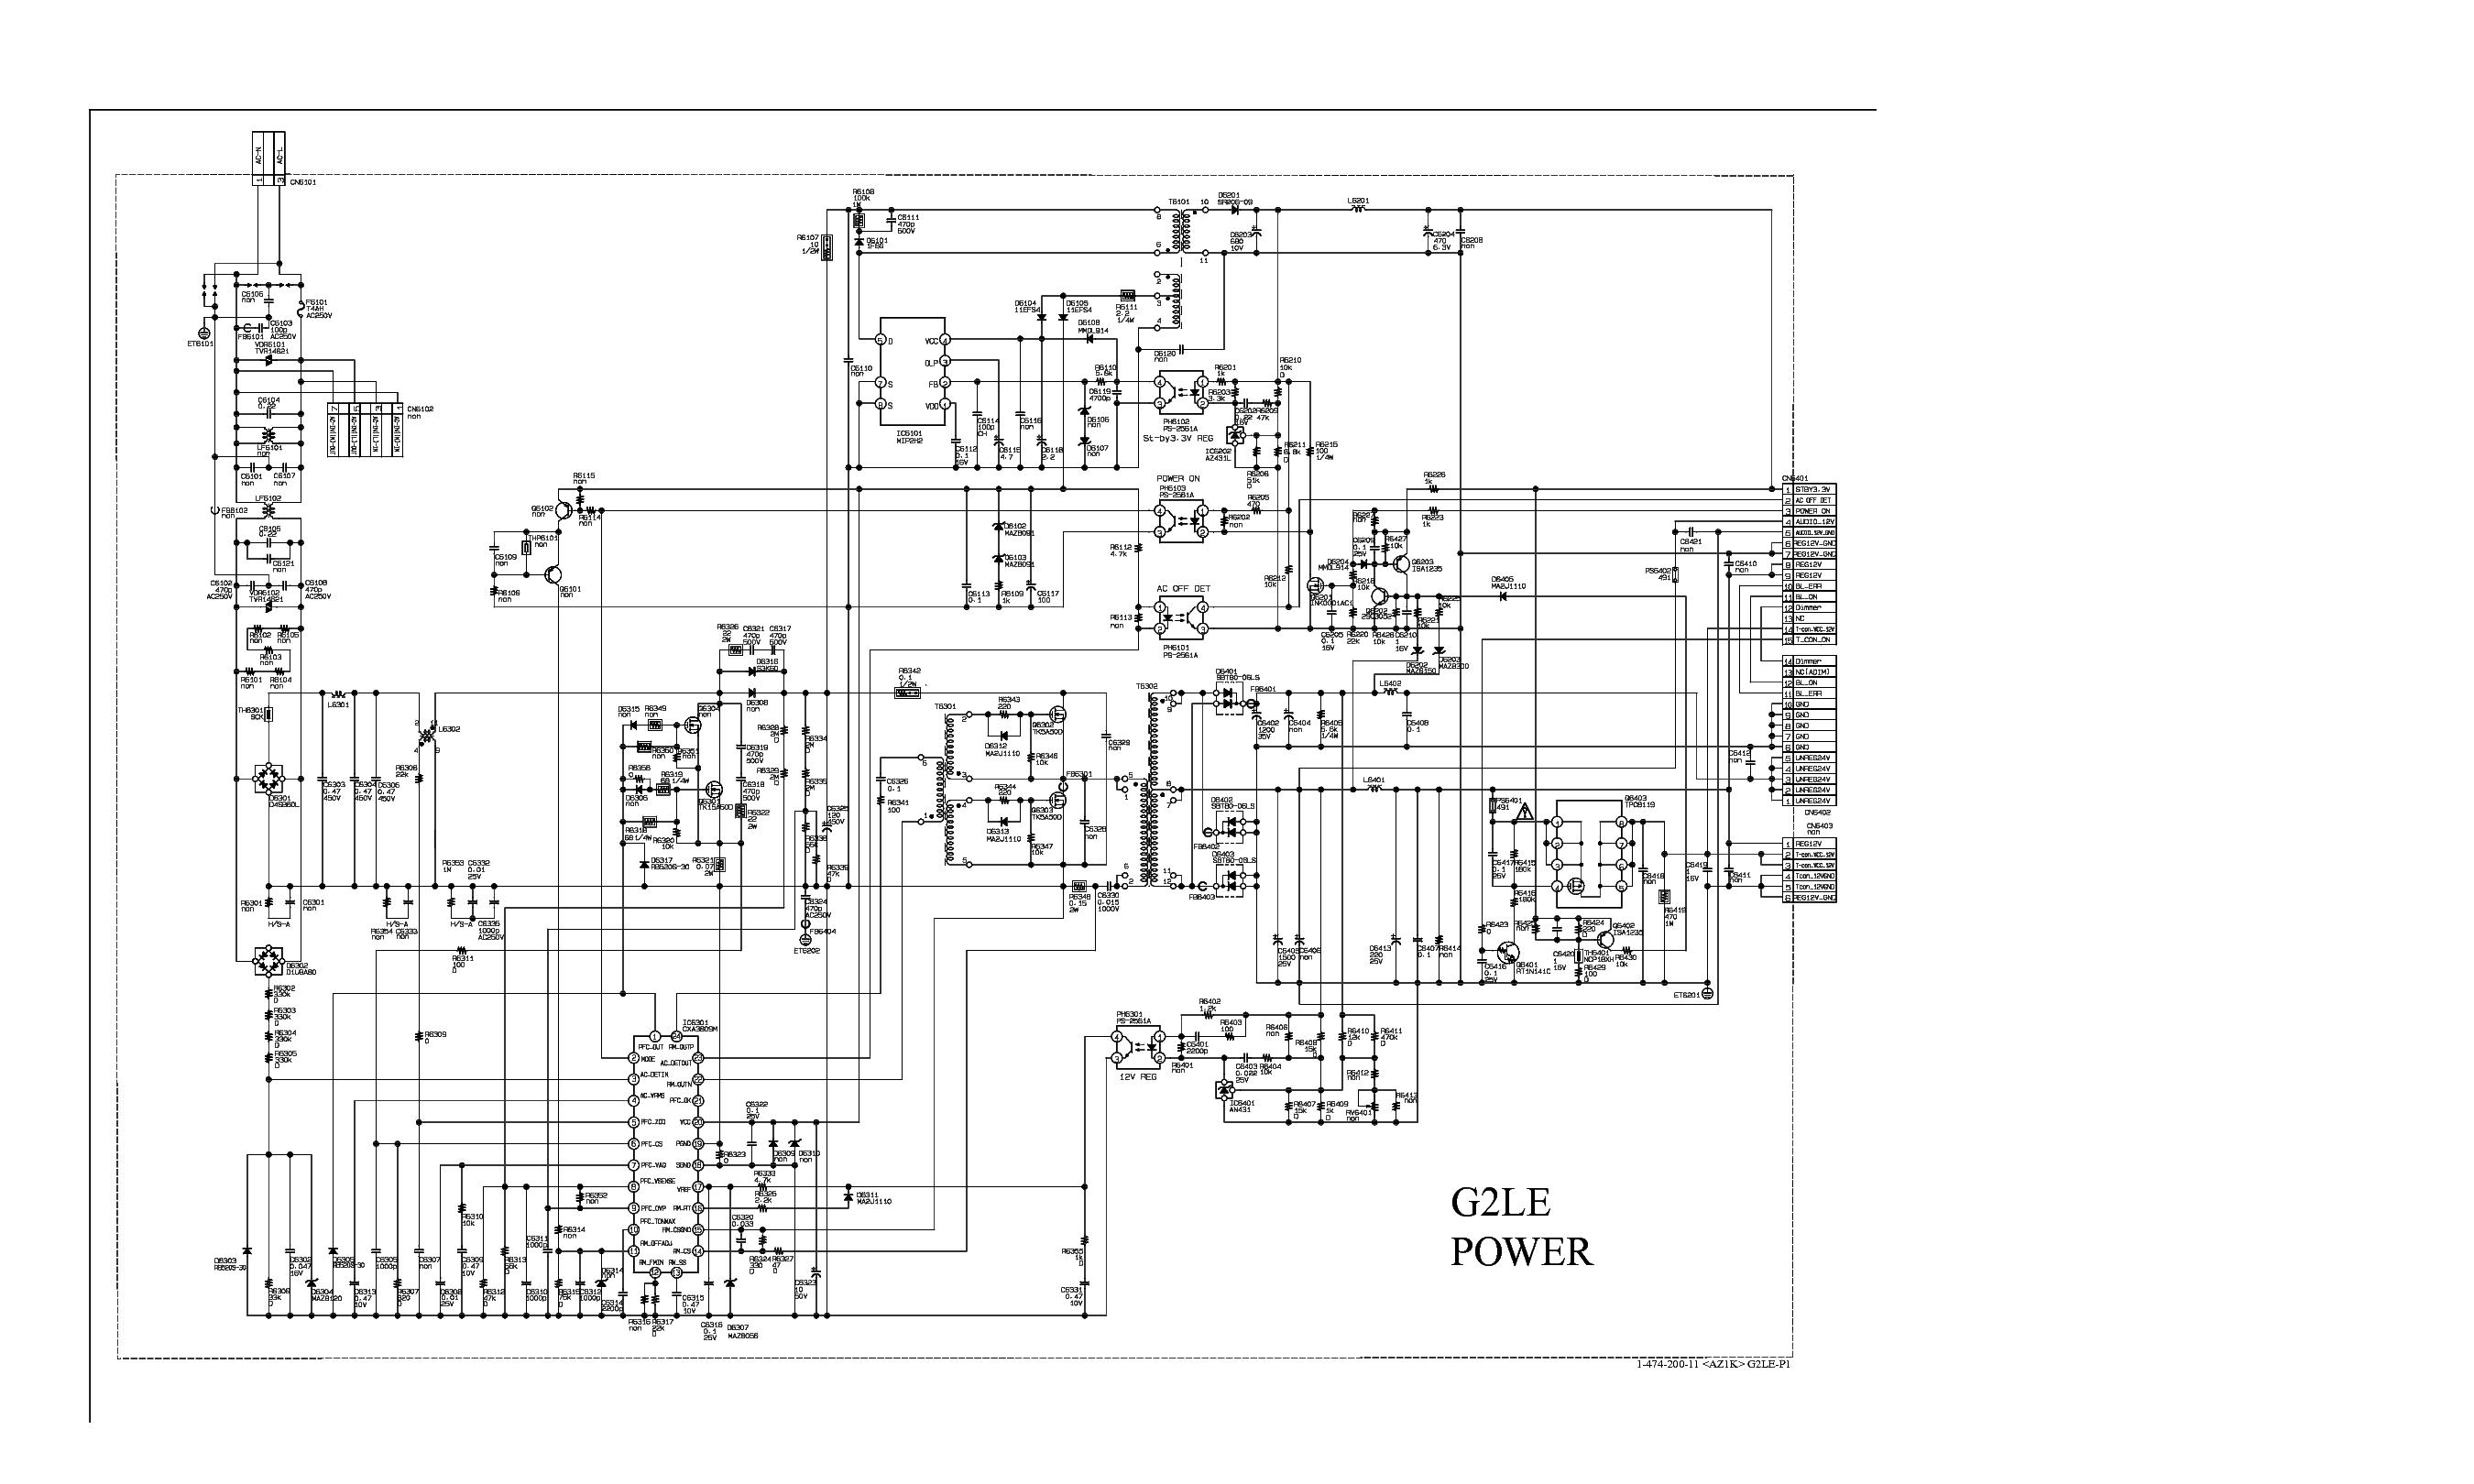 sony g2le p1 1 474 200 11 cxa3809m mip2h2 sch service manual rh elektrotanya com